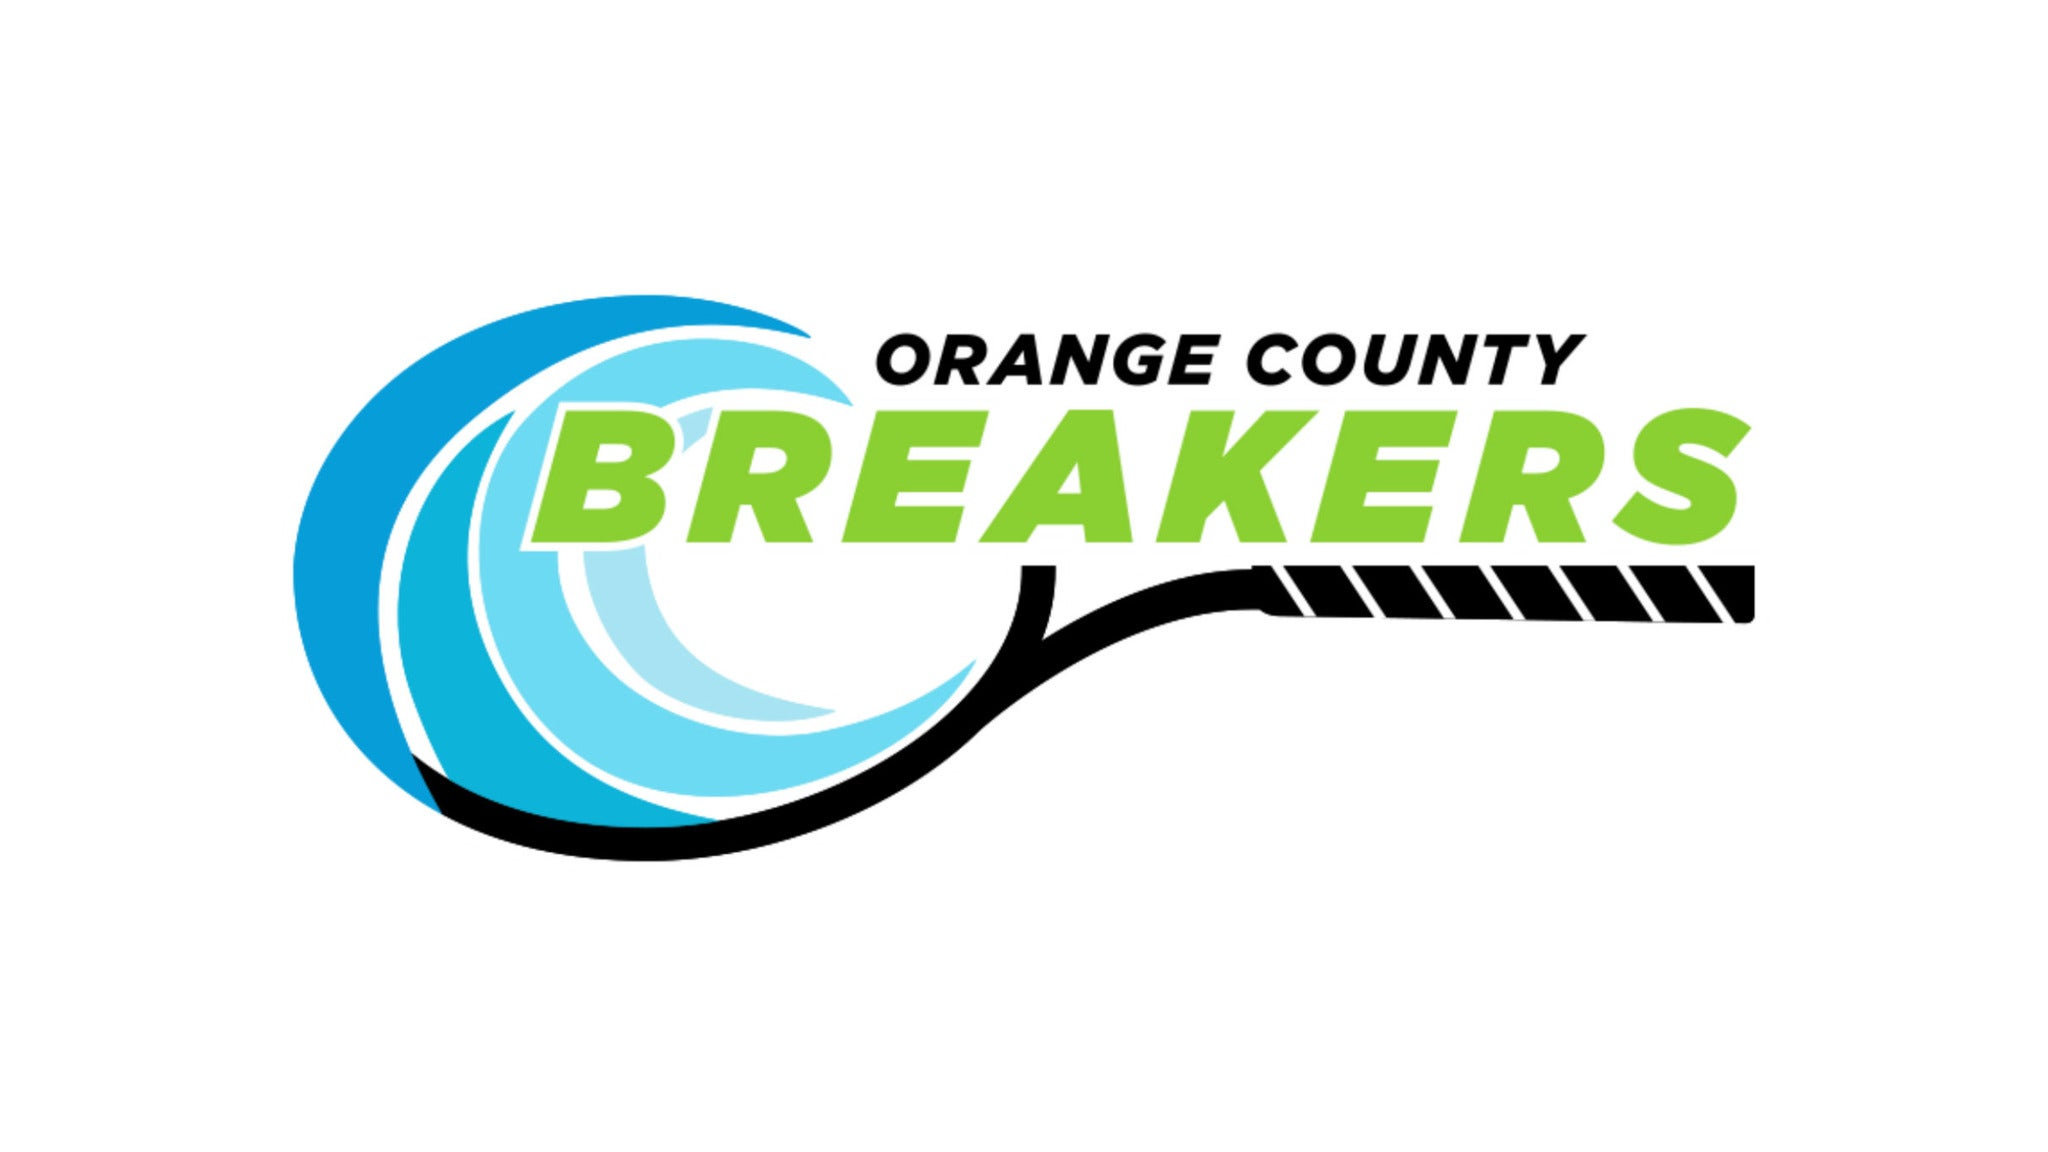 Orange County Breakers vs. San Diego Aviators